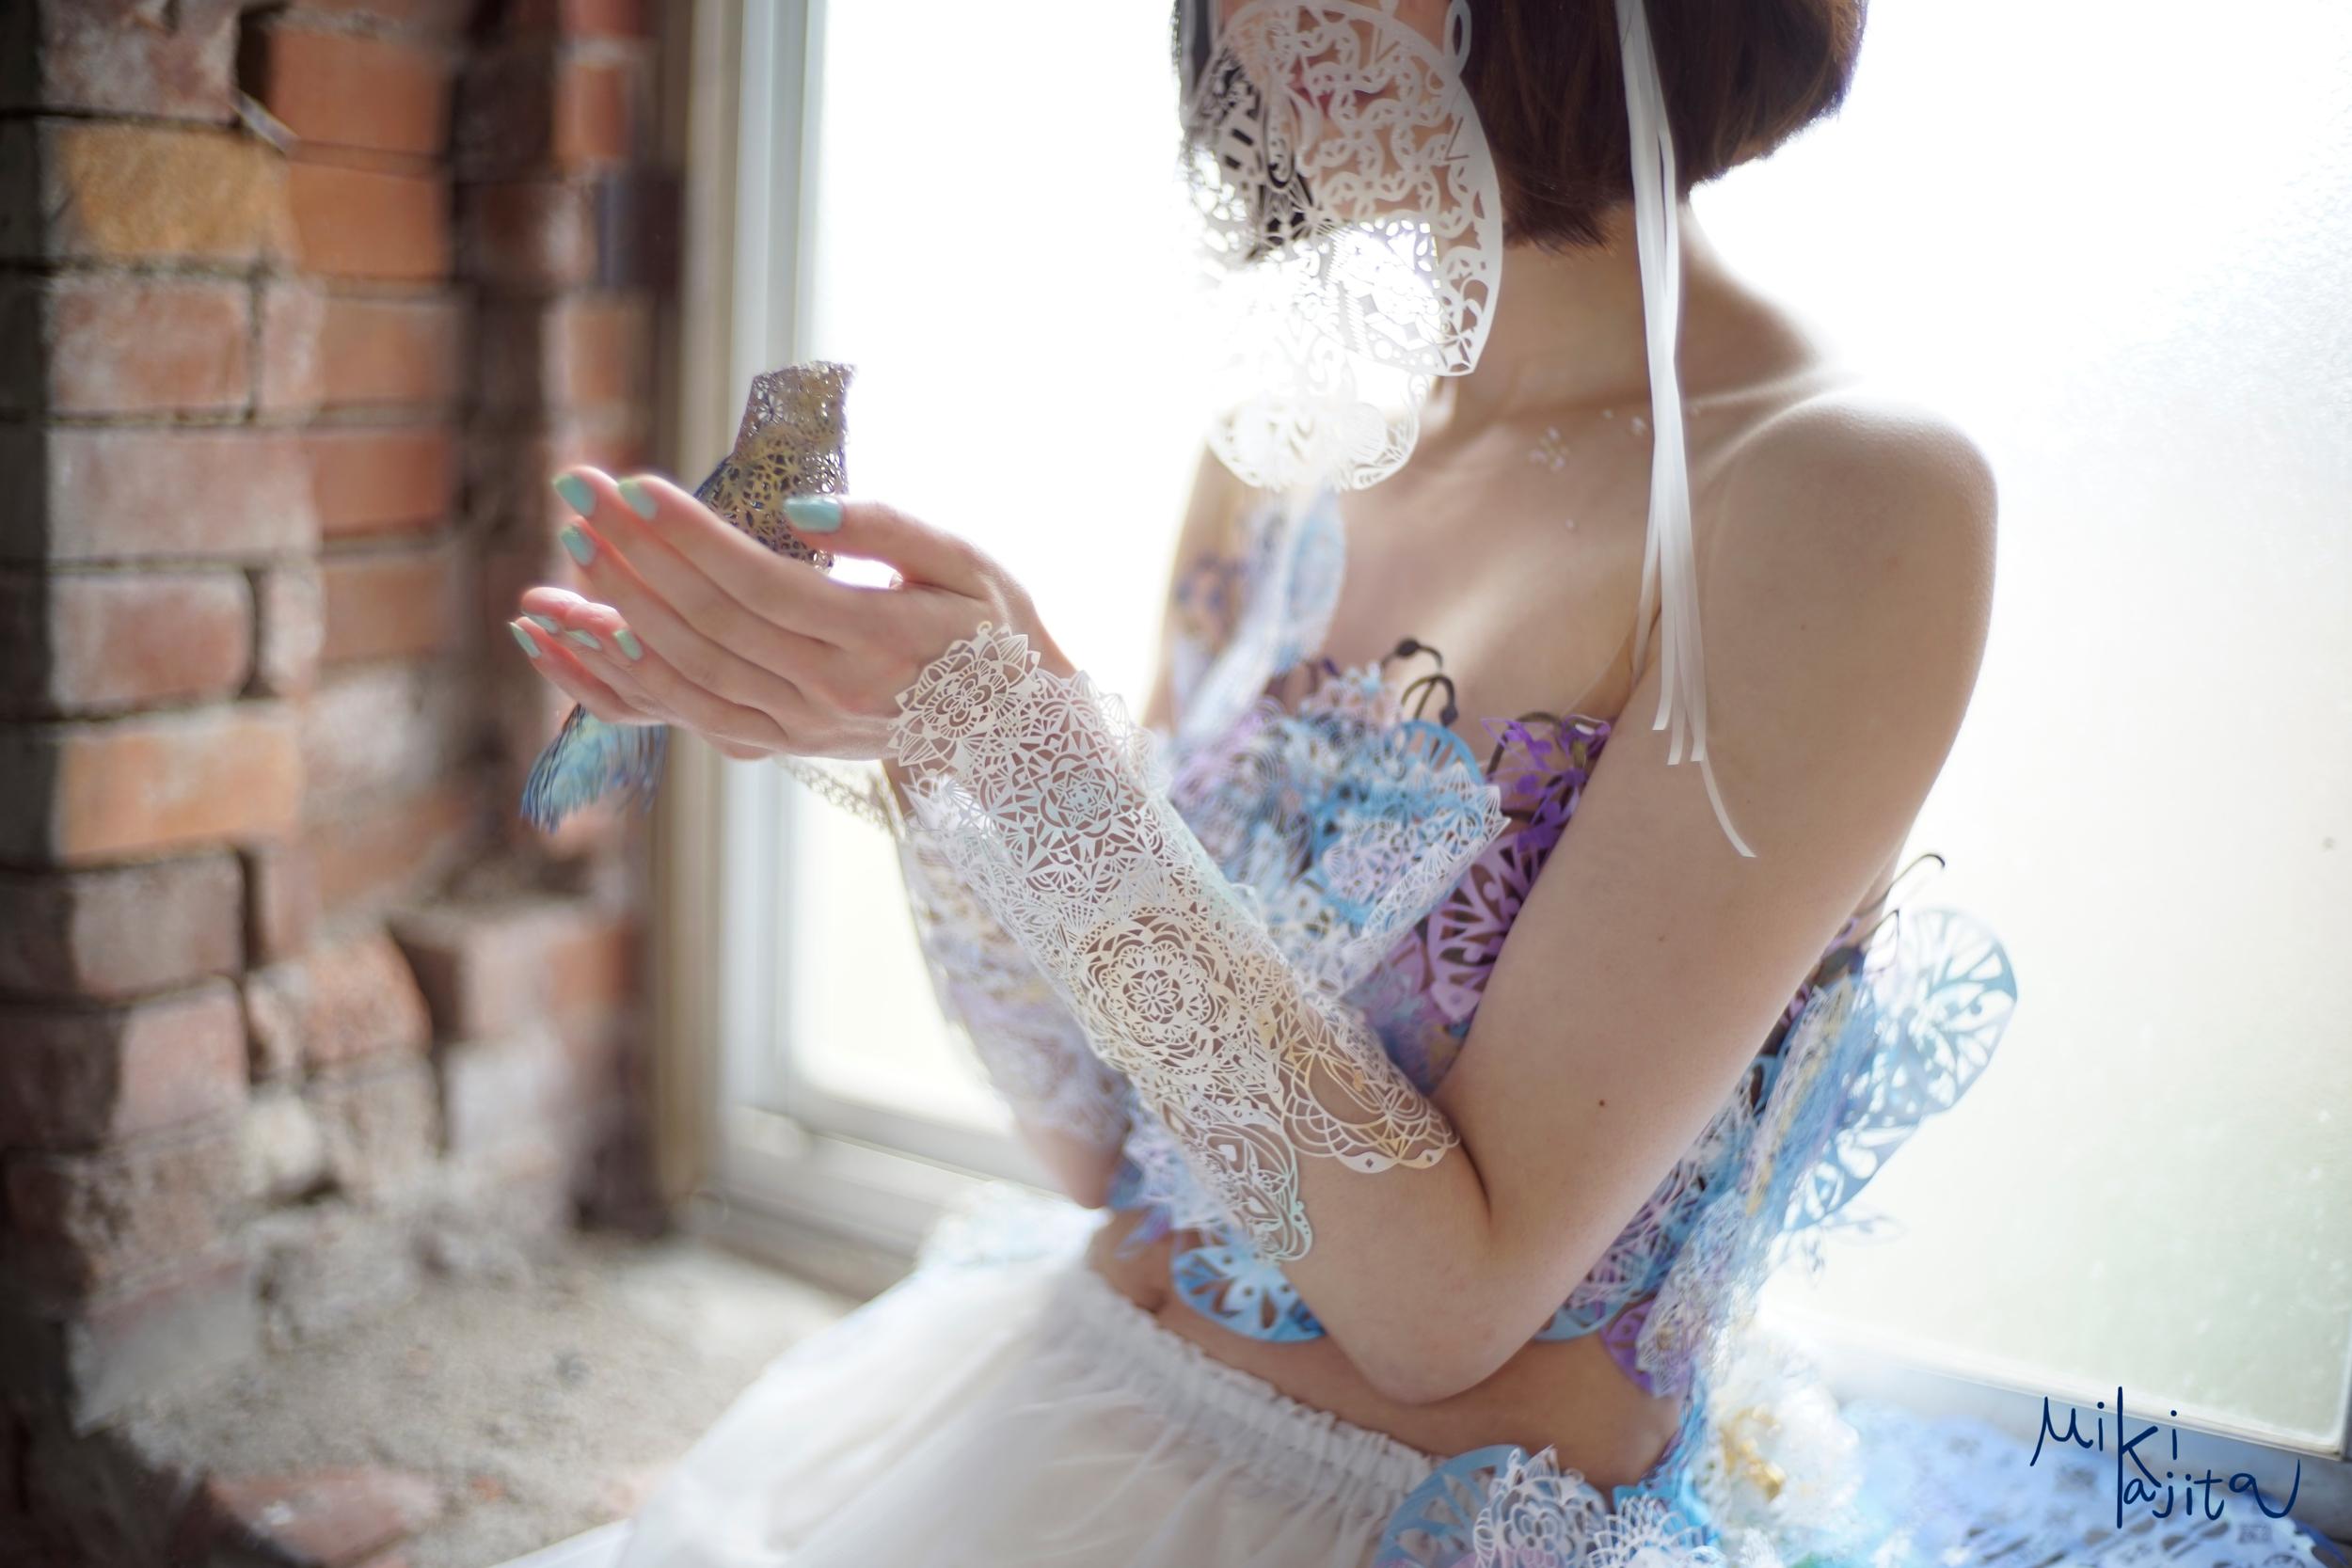 4/26 Miki Kajita & JCAT SHOWCASE 13